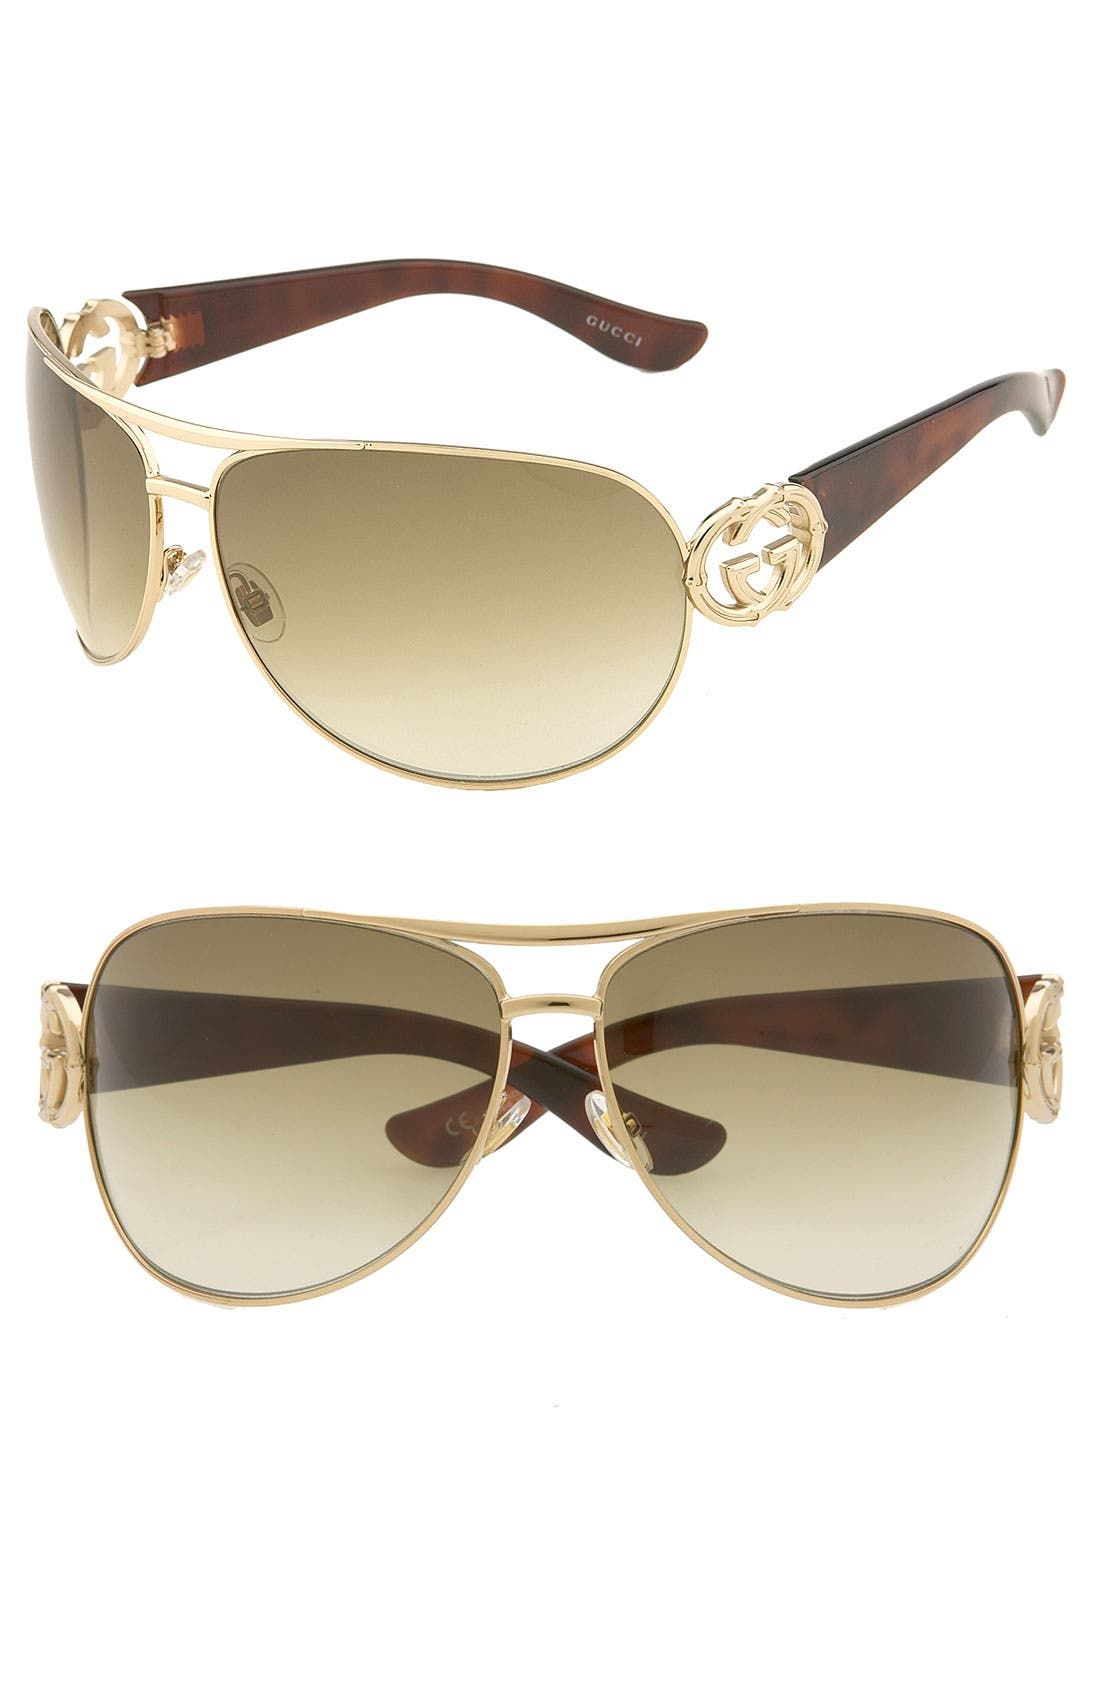 Alternate Image 1 Selected - Gucci Bamboo Logo Metal Aviator Sunglasses